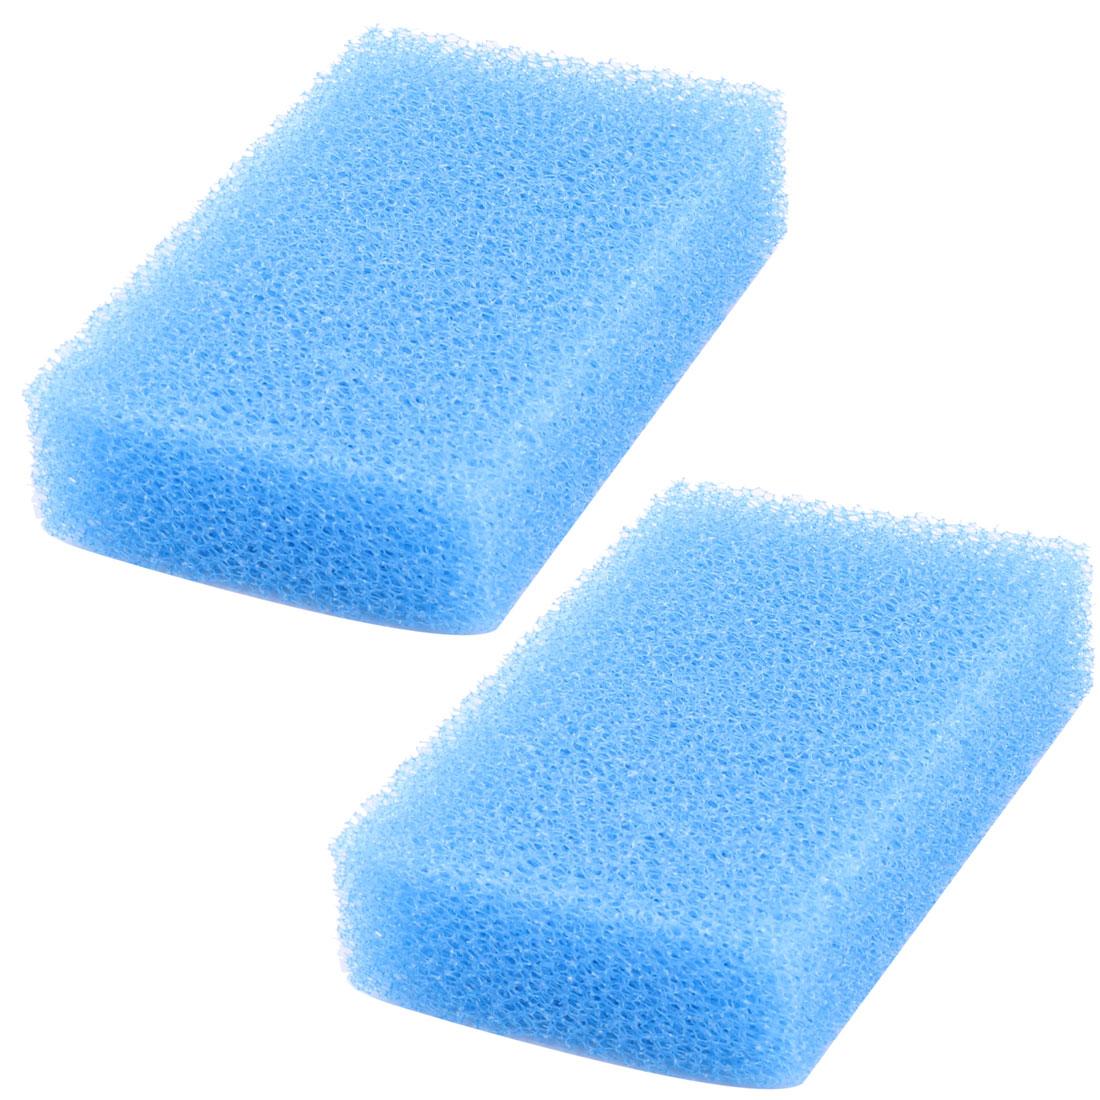 Home Kitchen Picnic Sponge Dish Bowl Plate Pan Pot Cleaning Washing Pad Blue 2pcs